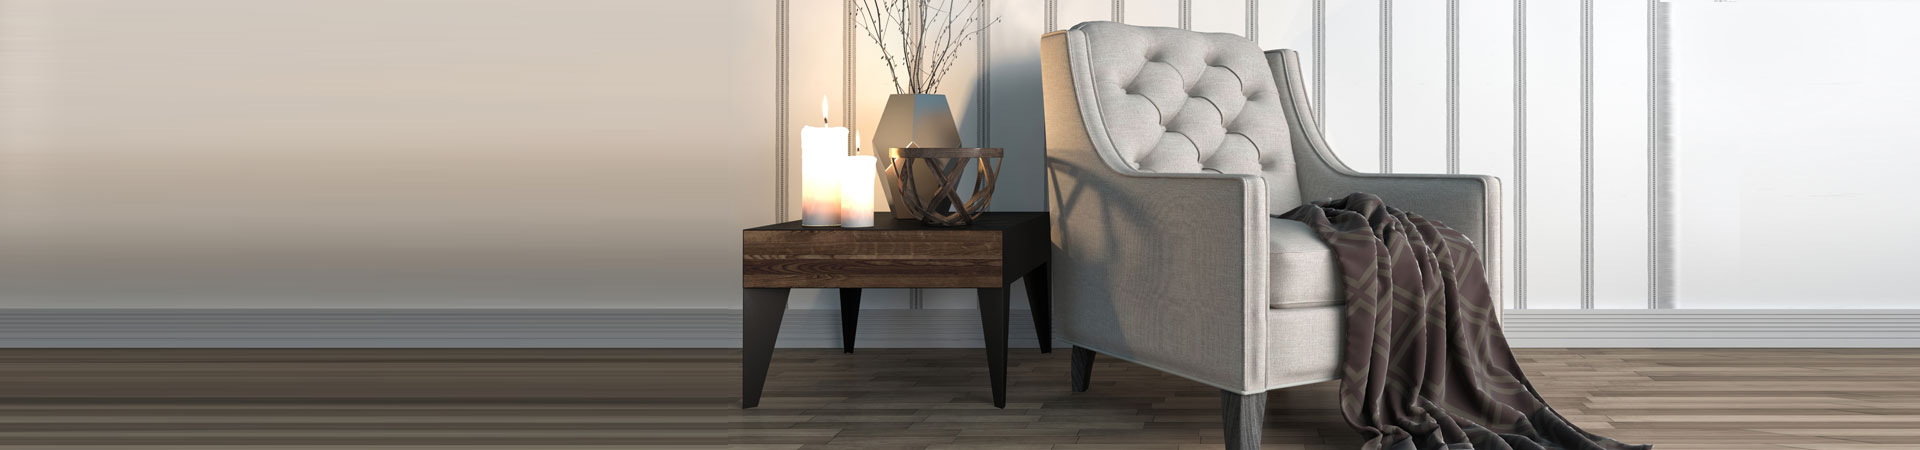 Contemporary Furniture Designed and